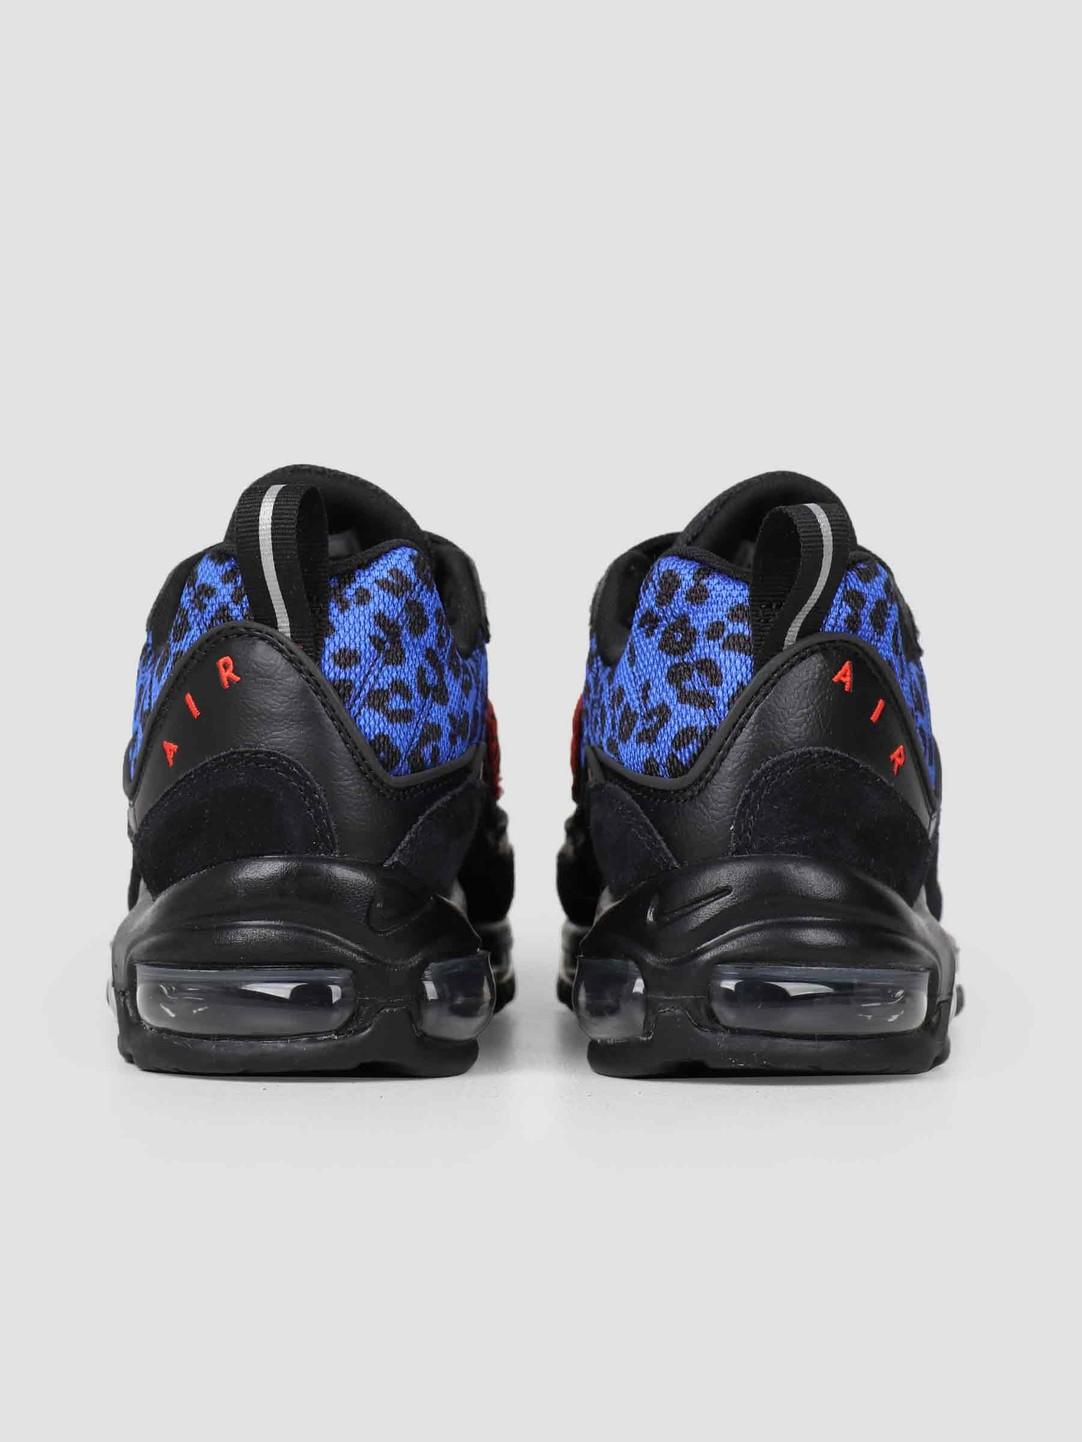 6ceba0661259 Nike Nike Air Max 98 Premium Black Habanero Red Racer Blue BV1978-001